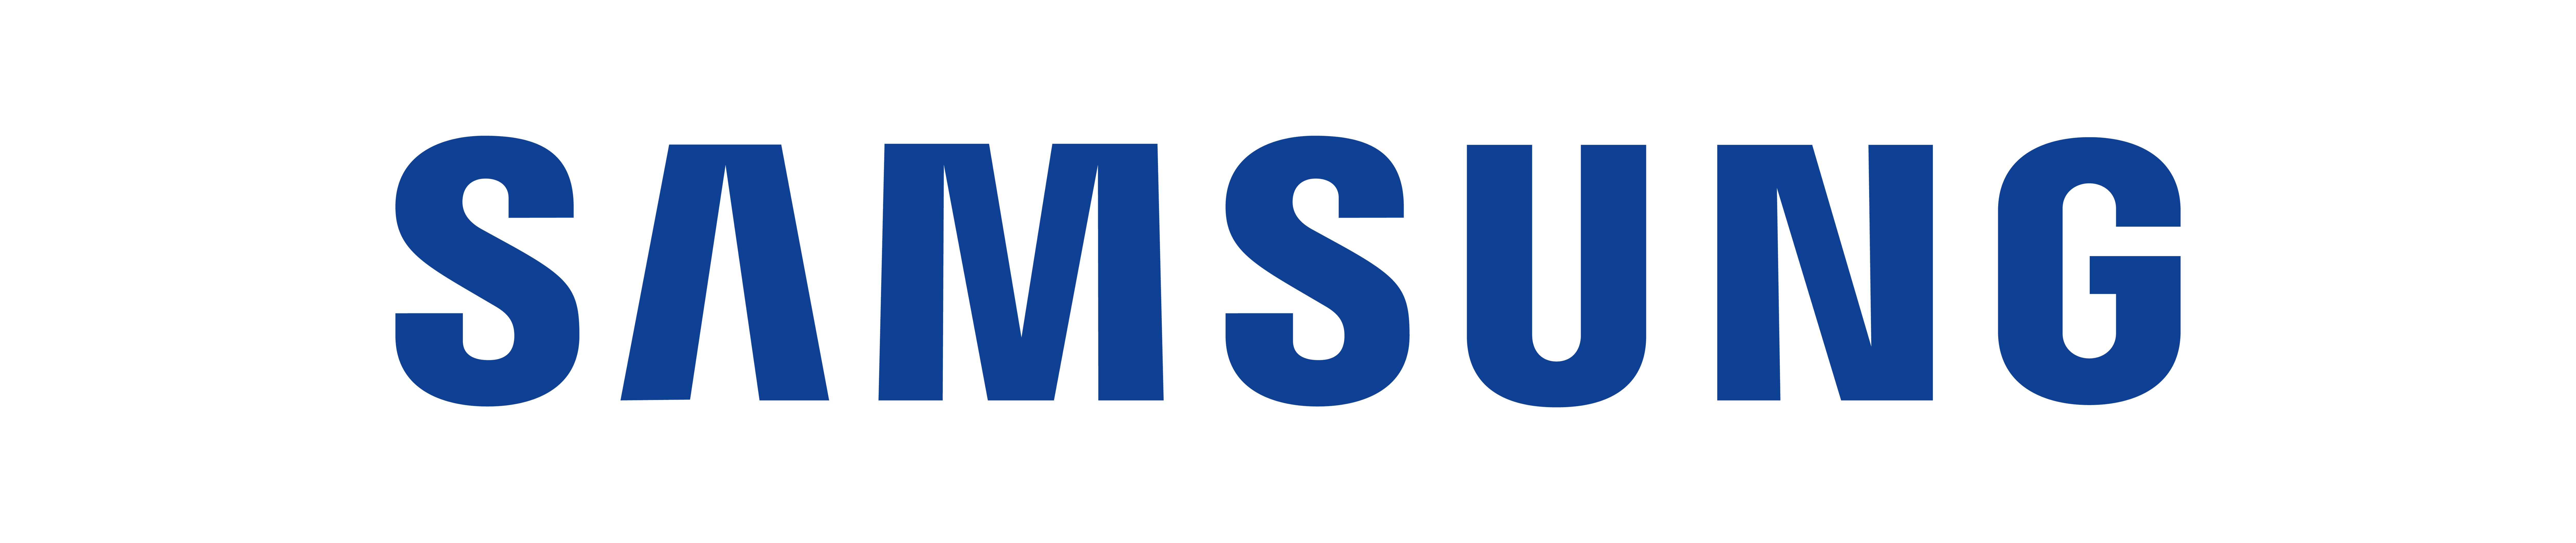 Samsung Logo Png - Free Transparent PNG Logos  Samsung Logo Pn...